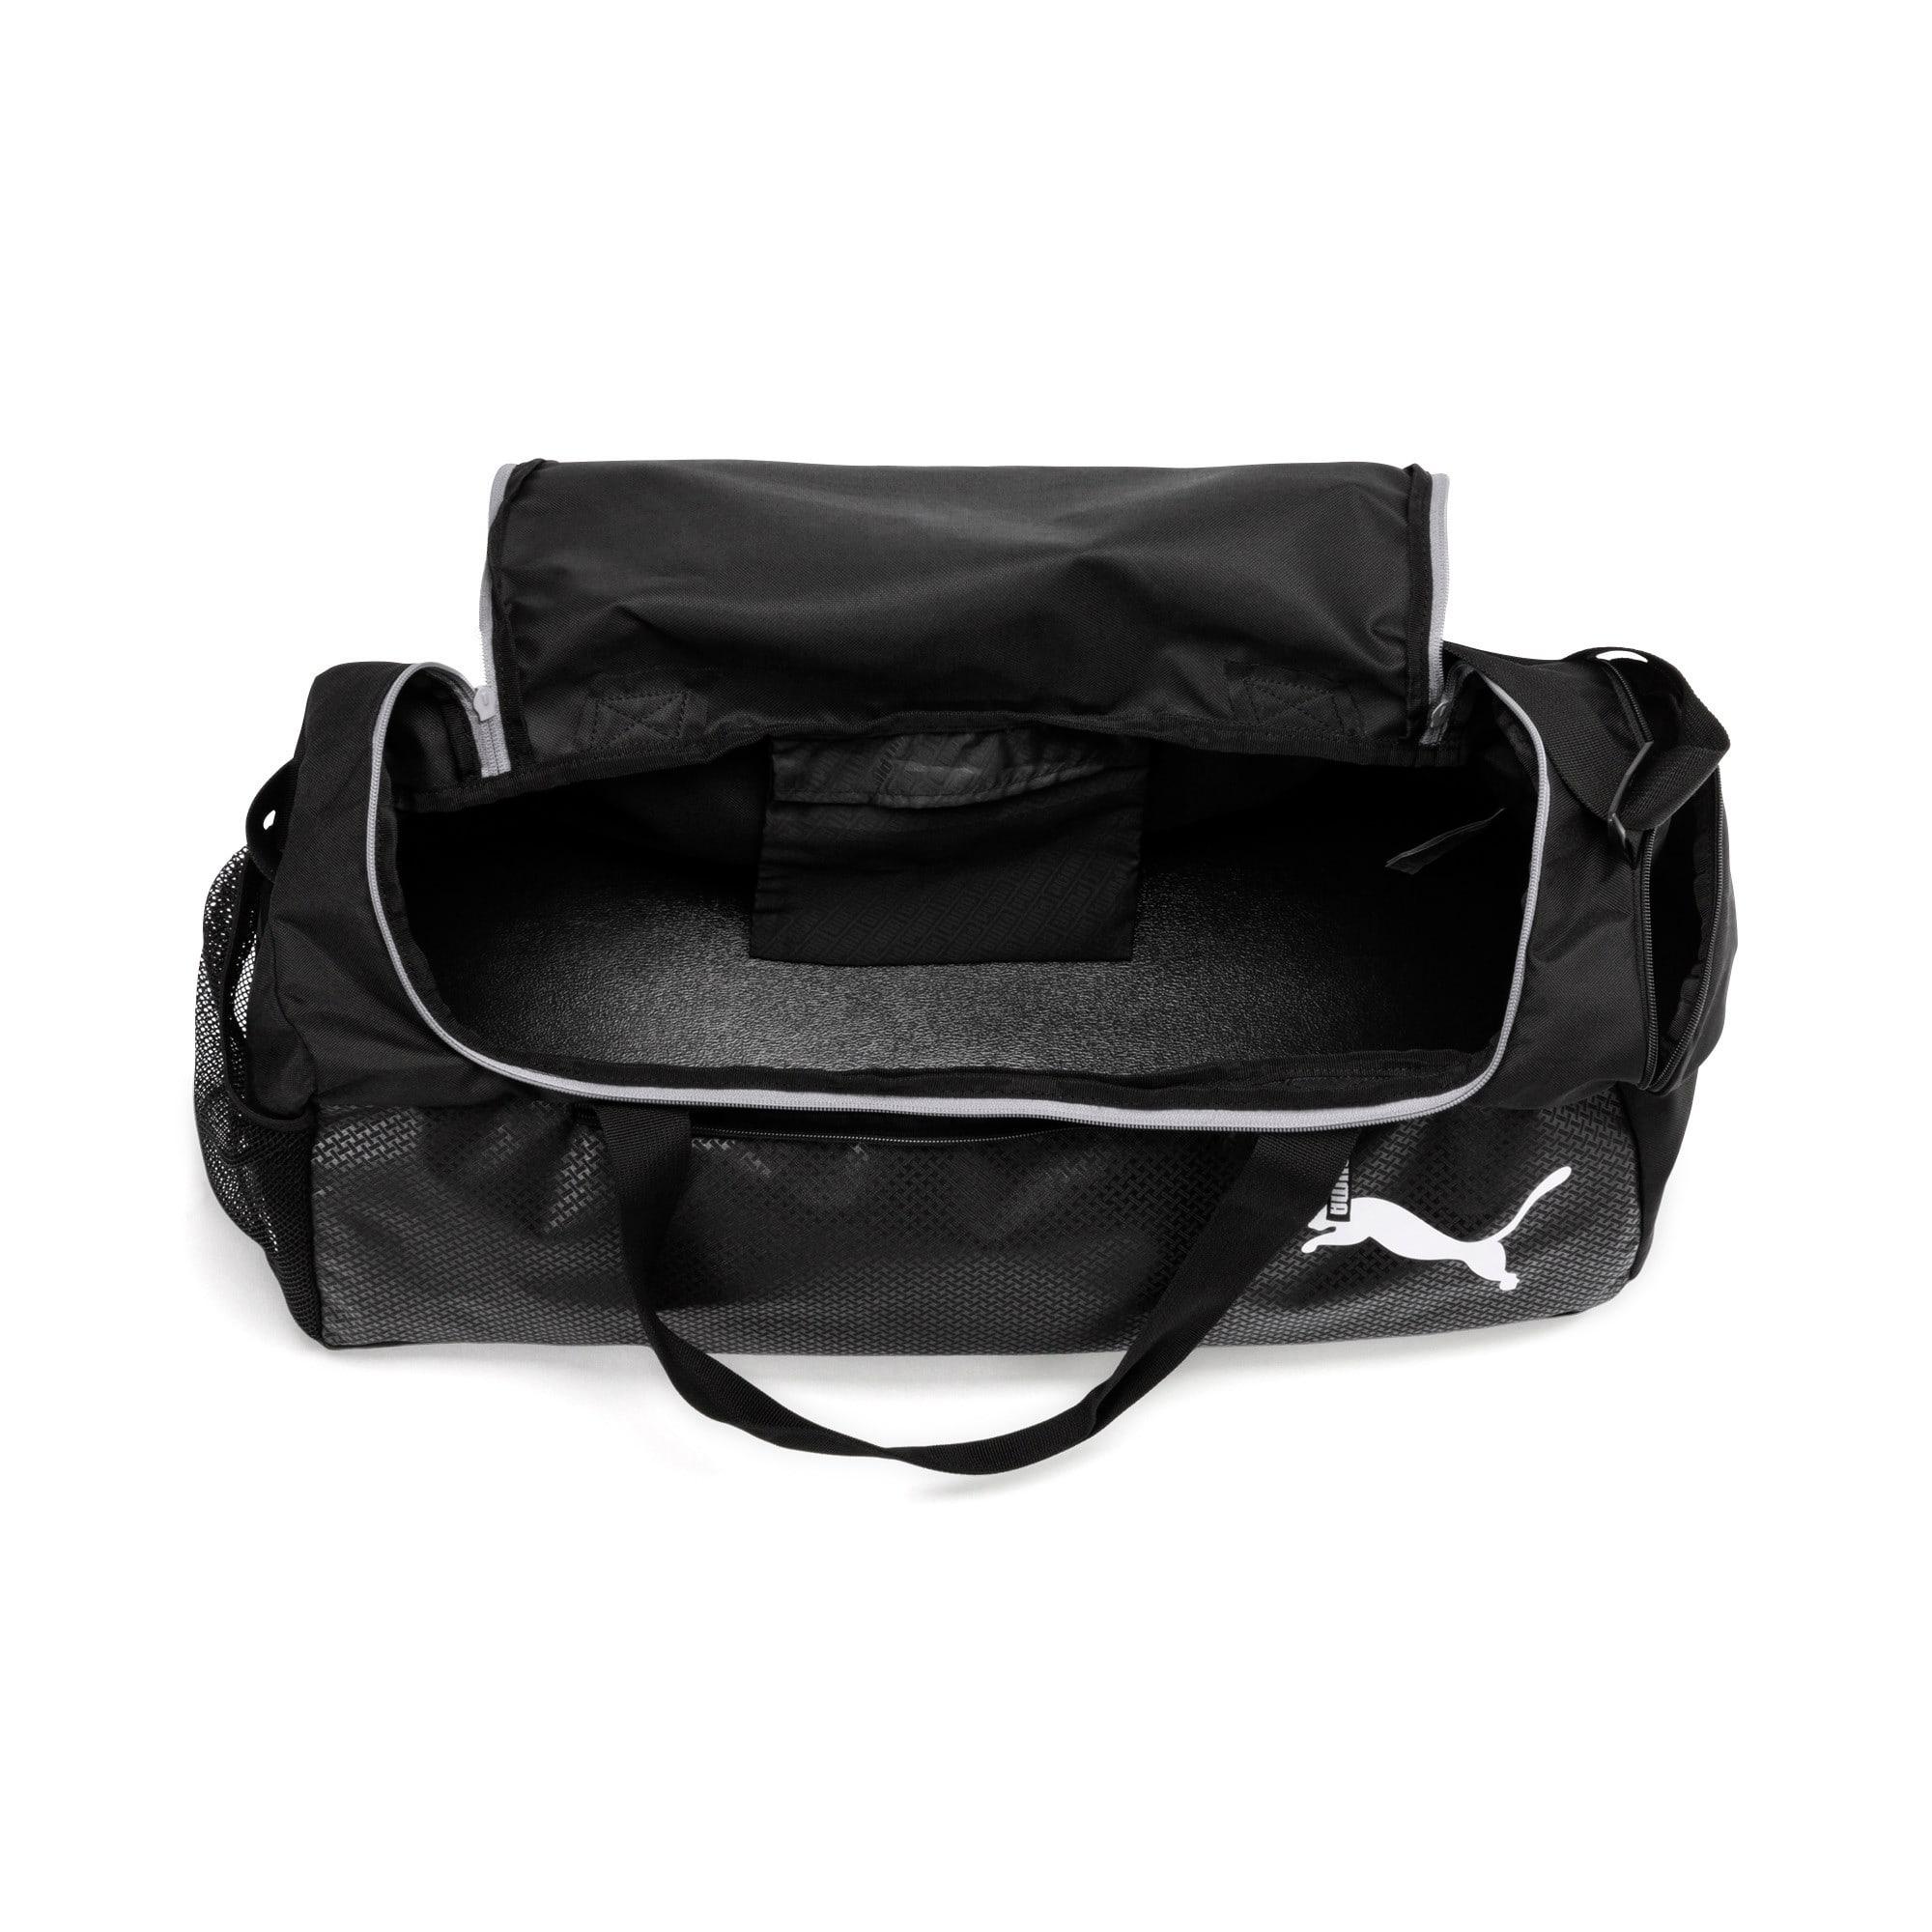 Thumbnail 3 of Fundamentals Medium Sports Bag, Puma Black, medium